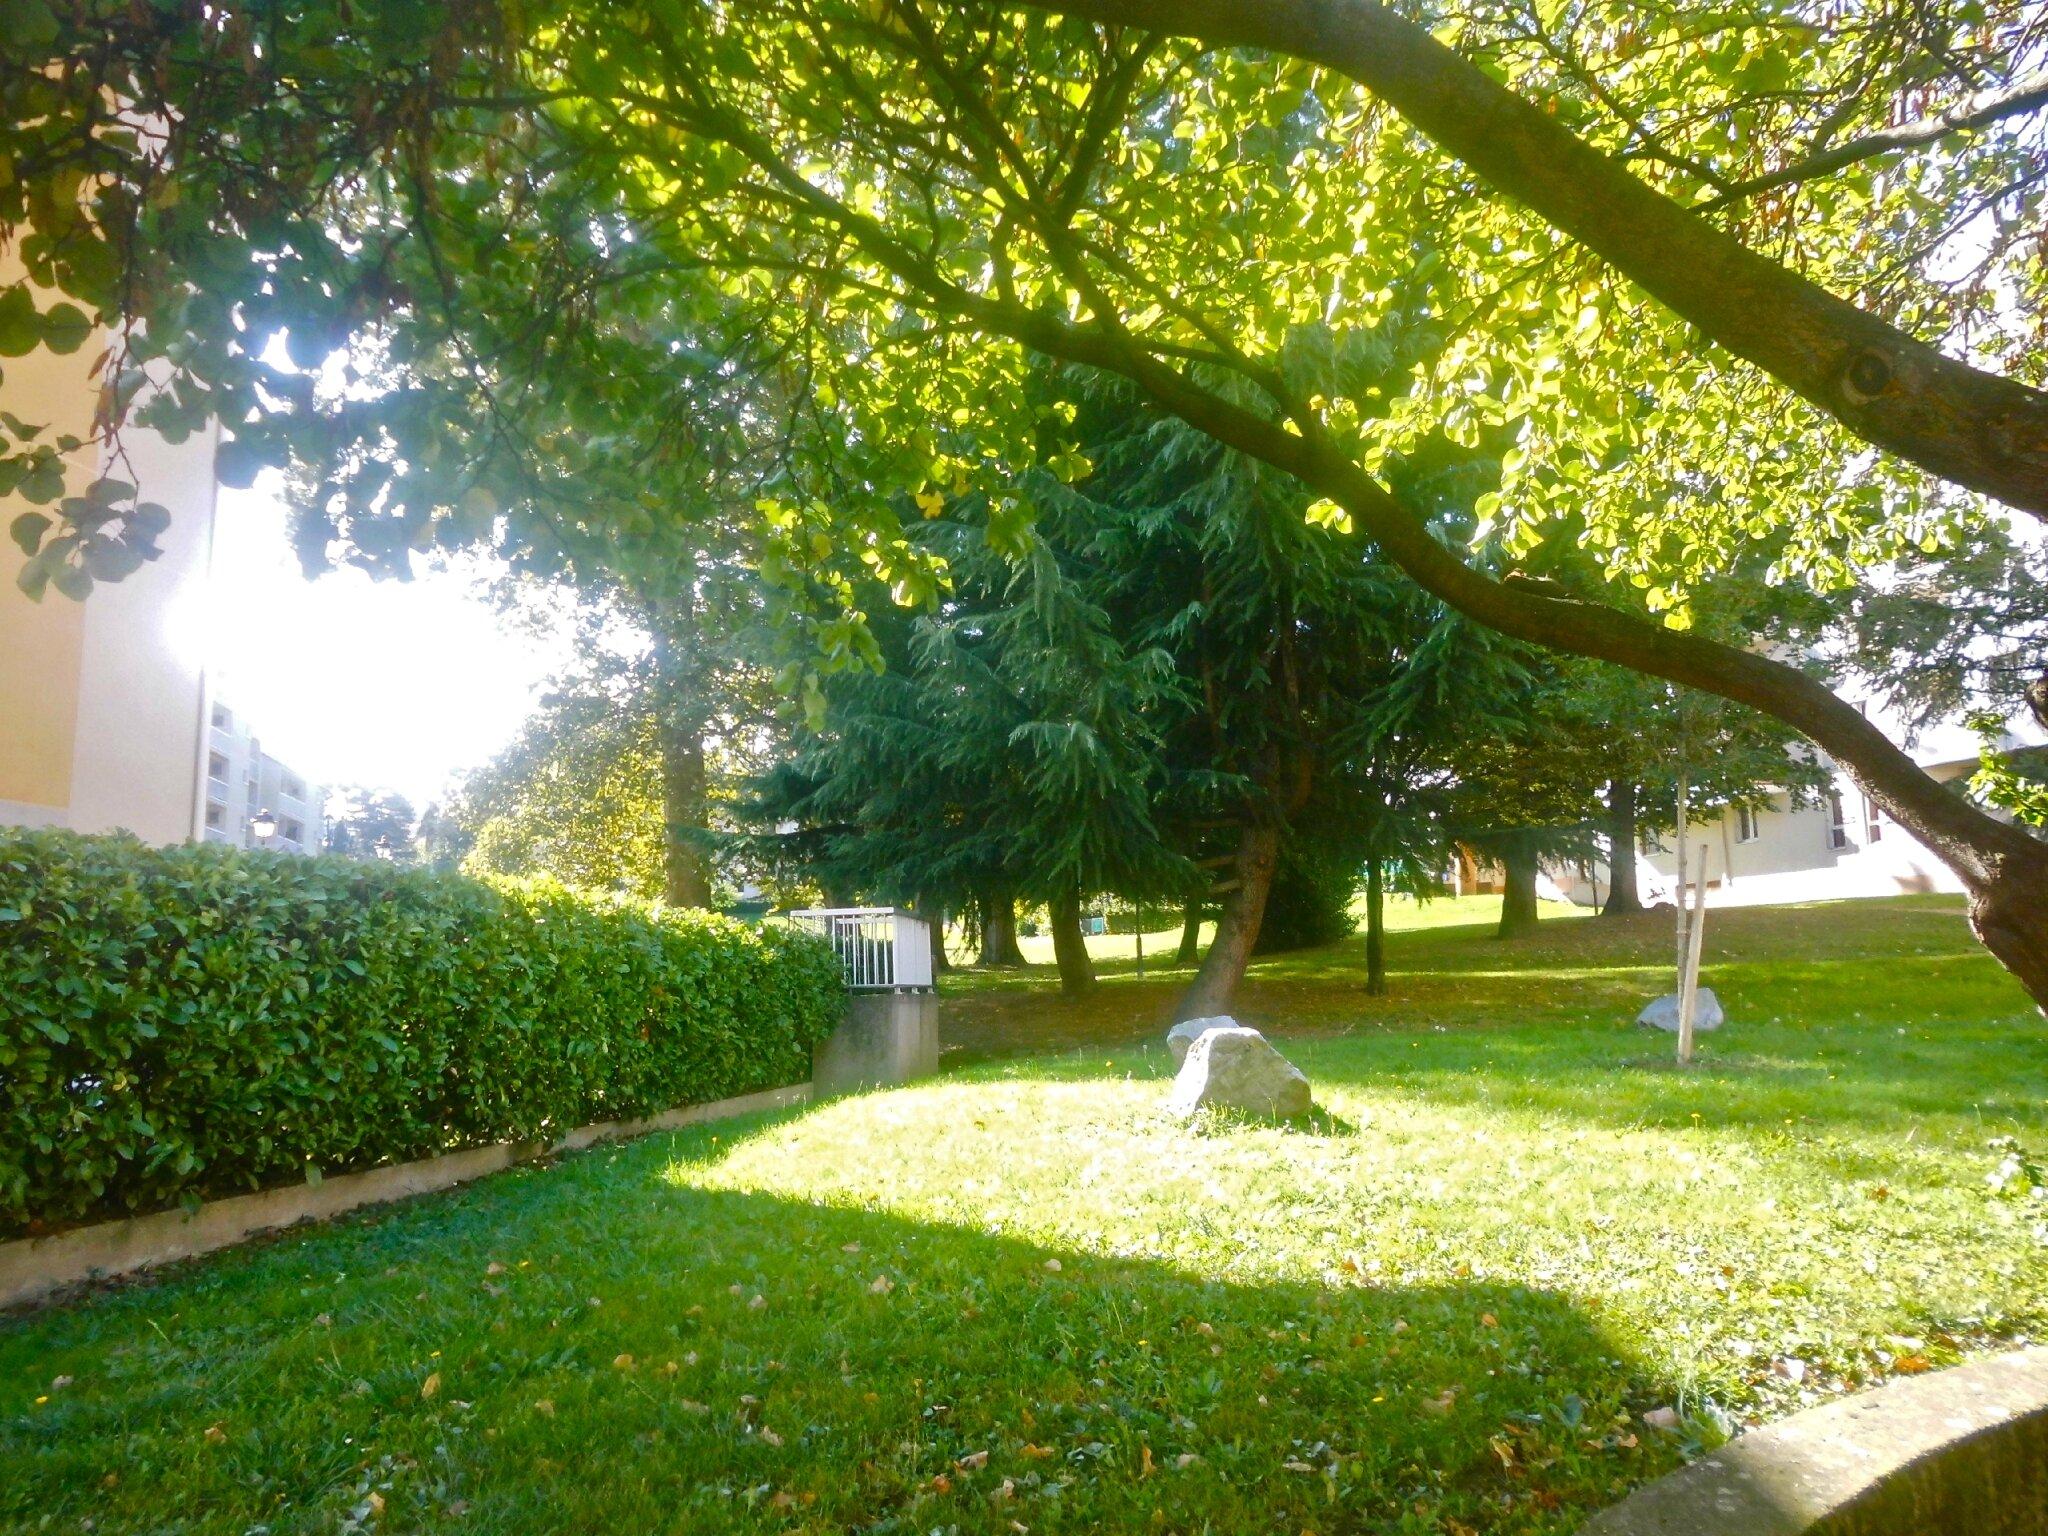 rue de la Brosse 21 sept 2014 (2)